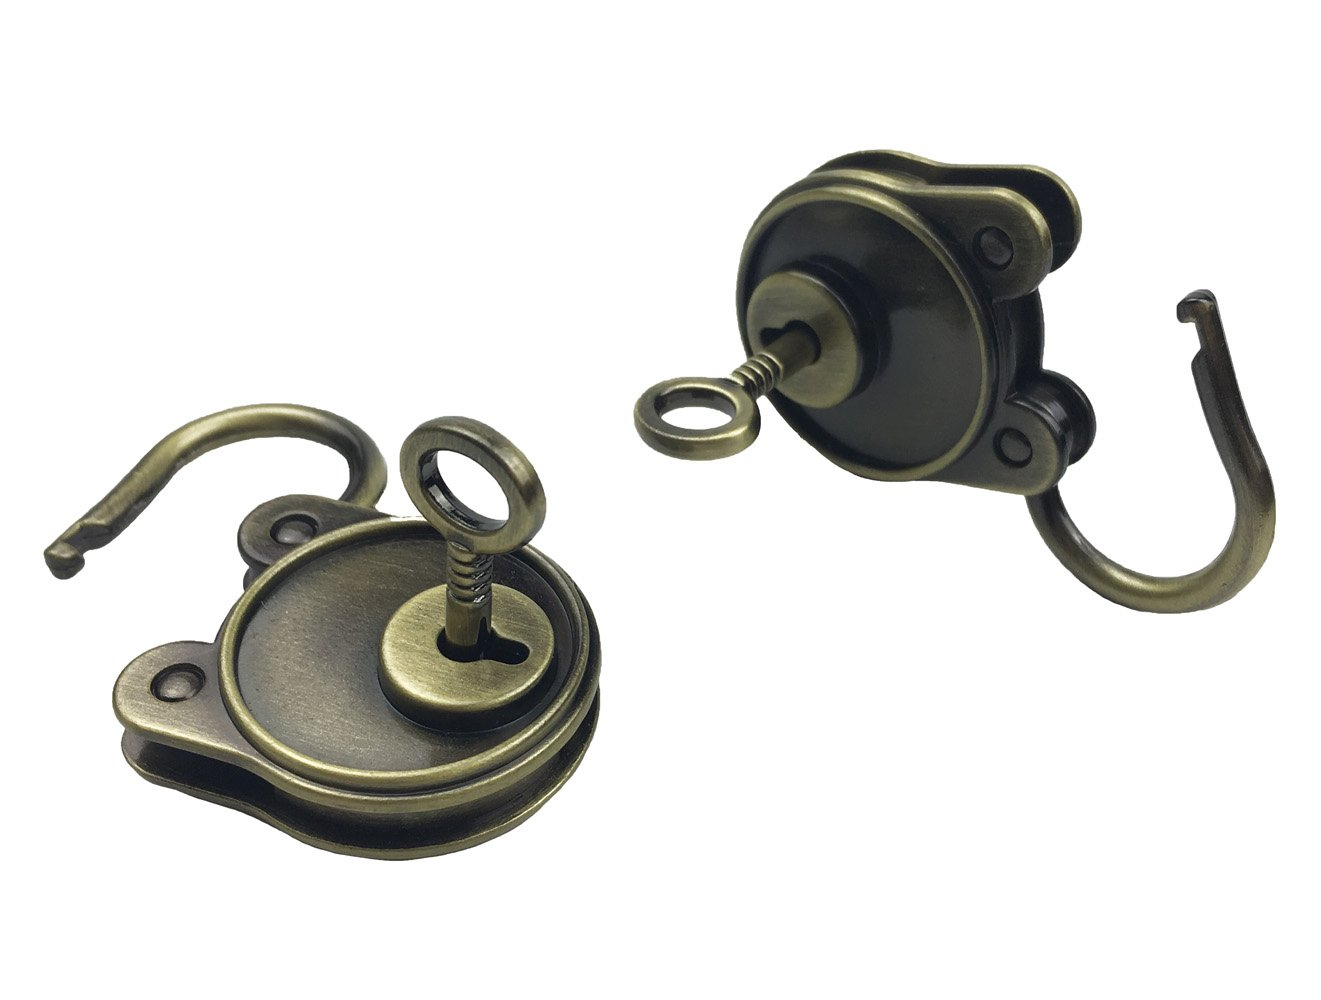 /並/行/輸/入/品 Bronze Hyamass 3pcs Vintage Antique Style Mini Archaize Padlocks Key Lock with Keys